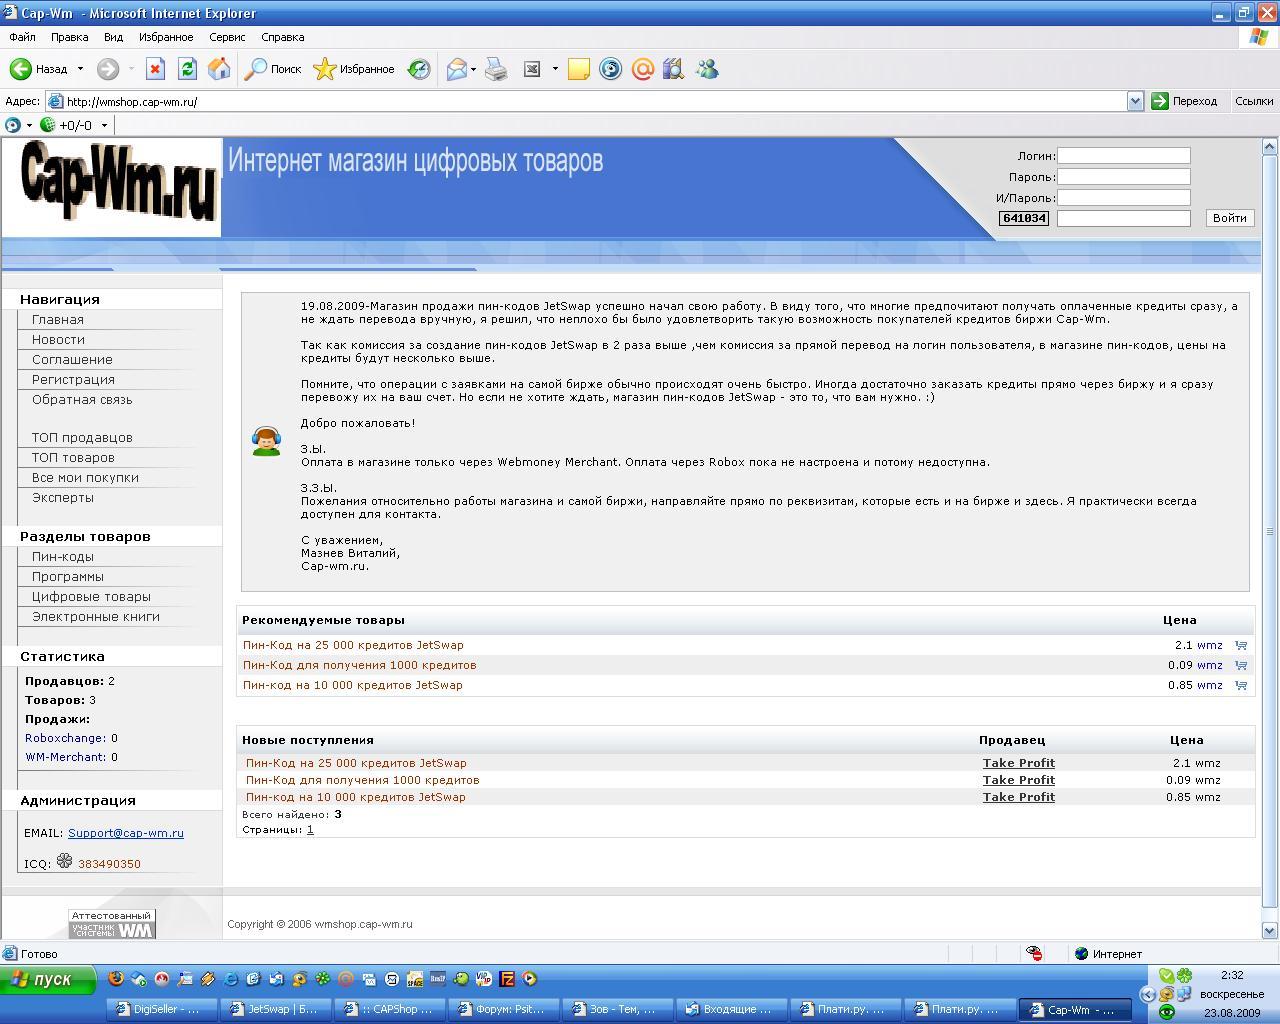 Италия ниссан логотип интернет-магазины листьев онлайн и оффлайн.